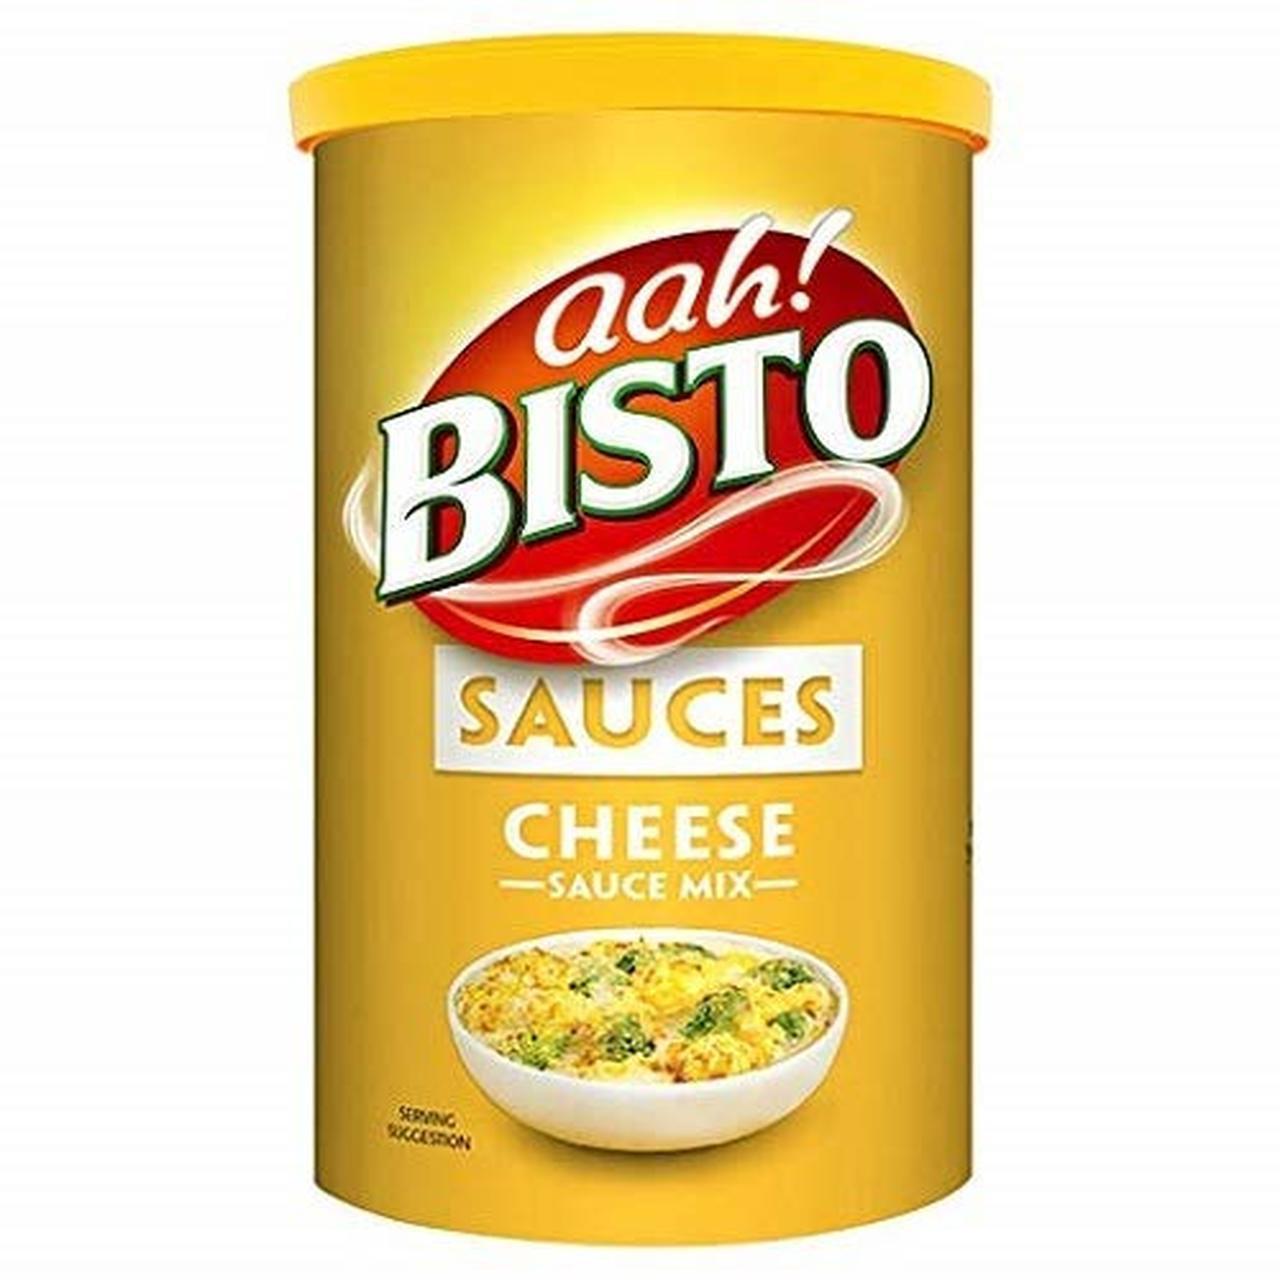 Bisto Sauces- Cheese, 190g